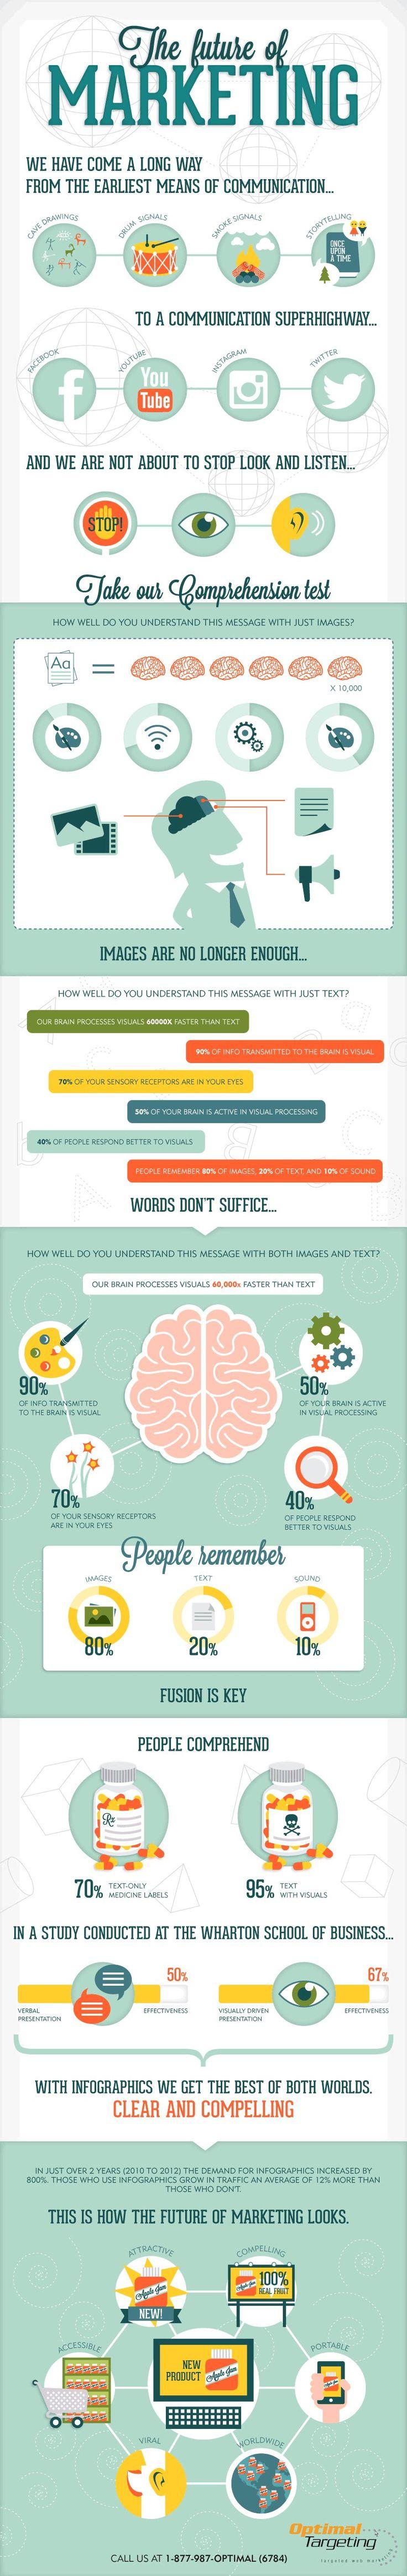 The Future of Marketing-Infographic #Visual #Marketing